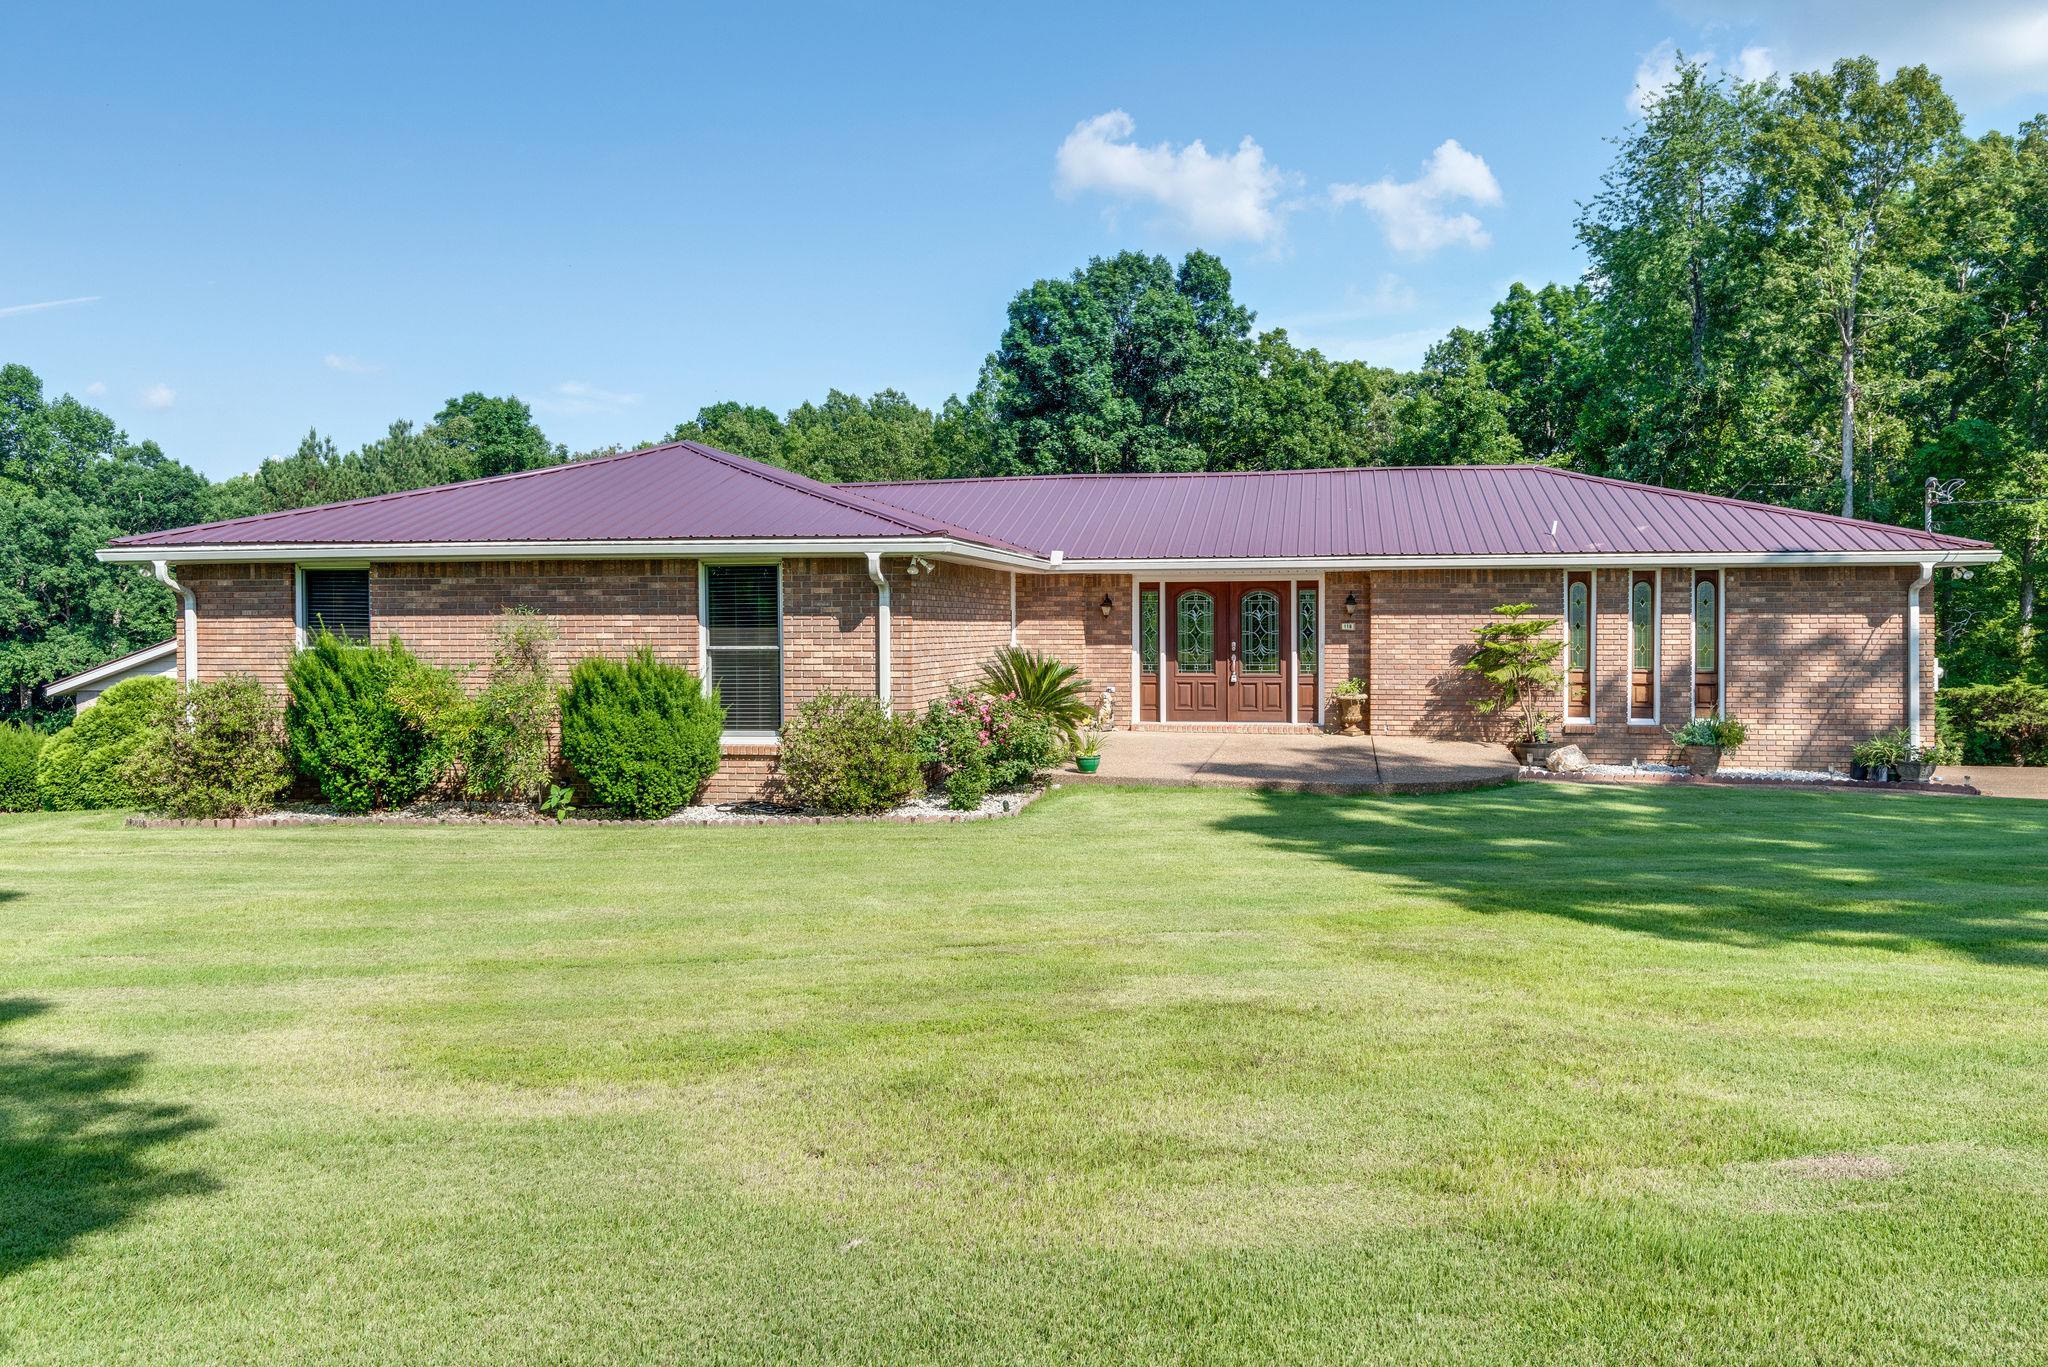 118 Sycamore Rd, Dickson, TN 37055 - Dickson, TN real estate listing